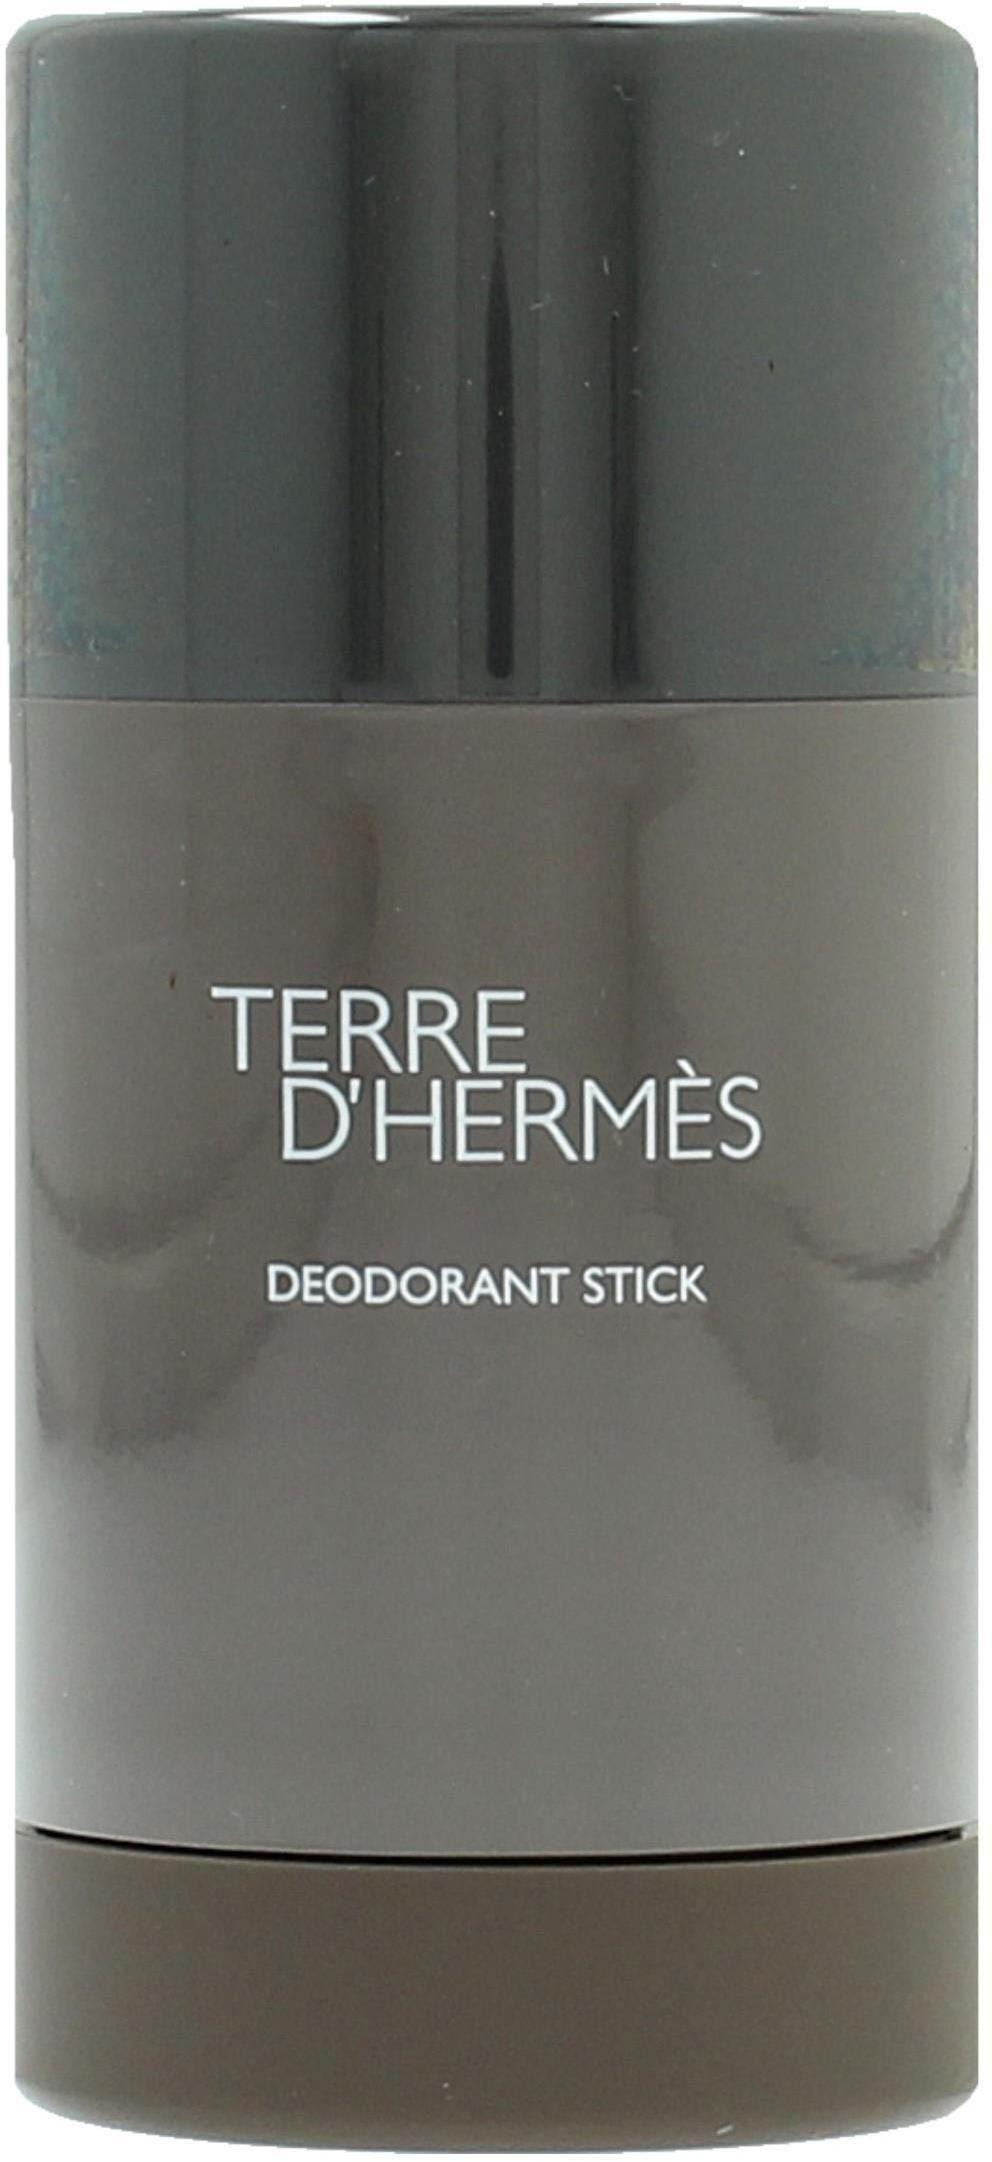 Hermès, »Terre d'Hermès «, Deodorant Stick